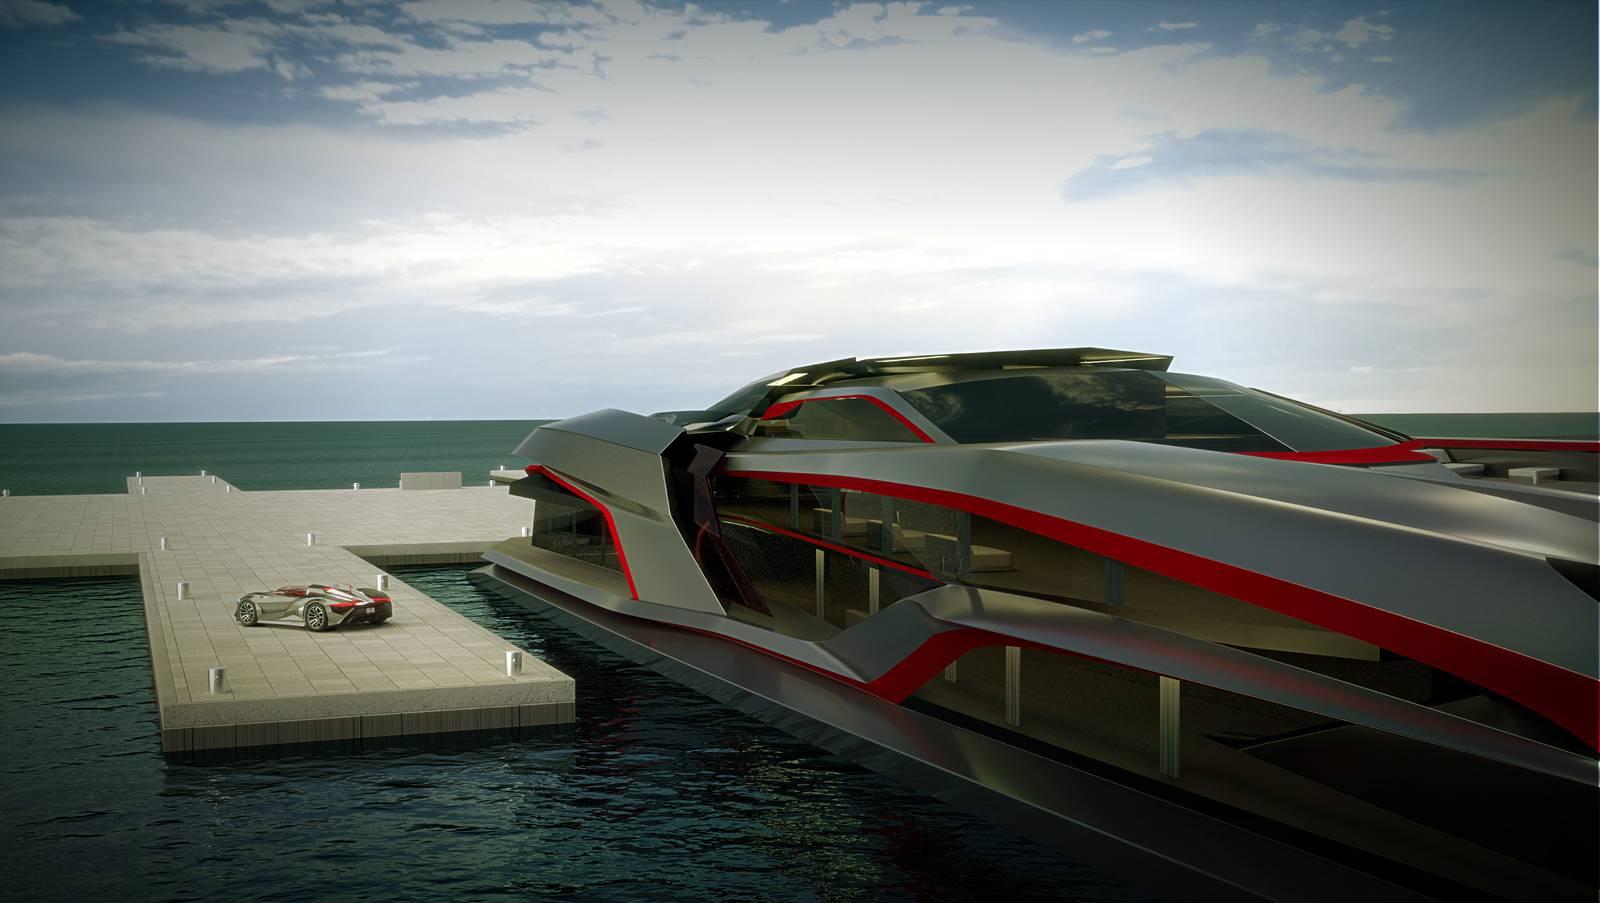 Kraken yacht